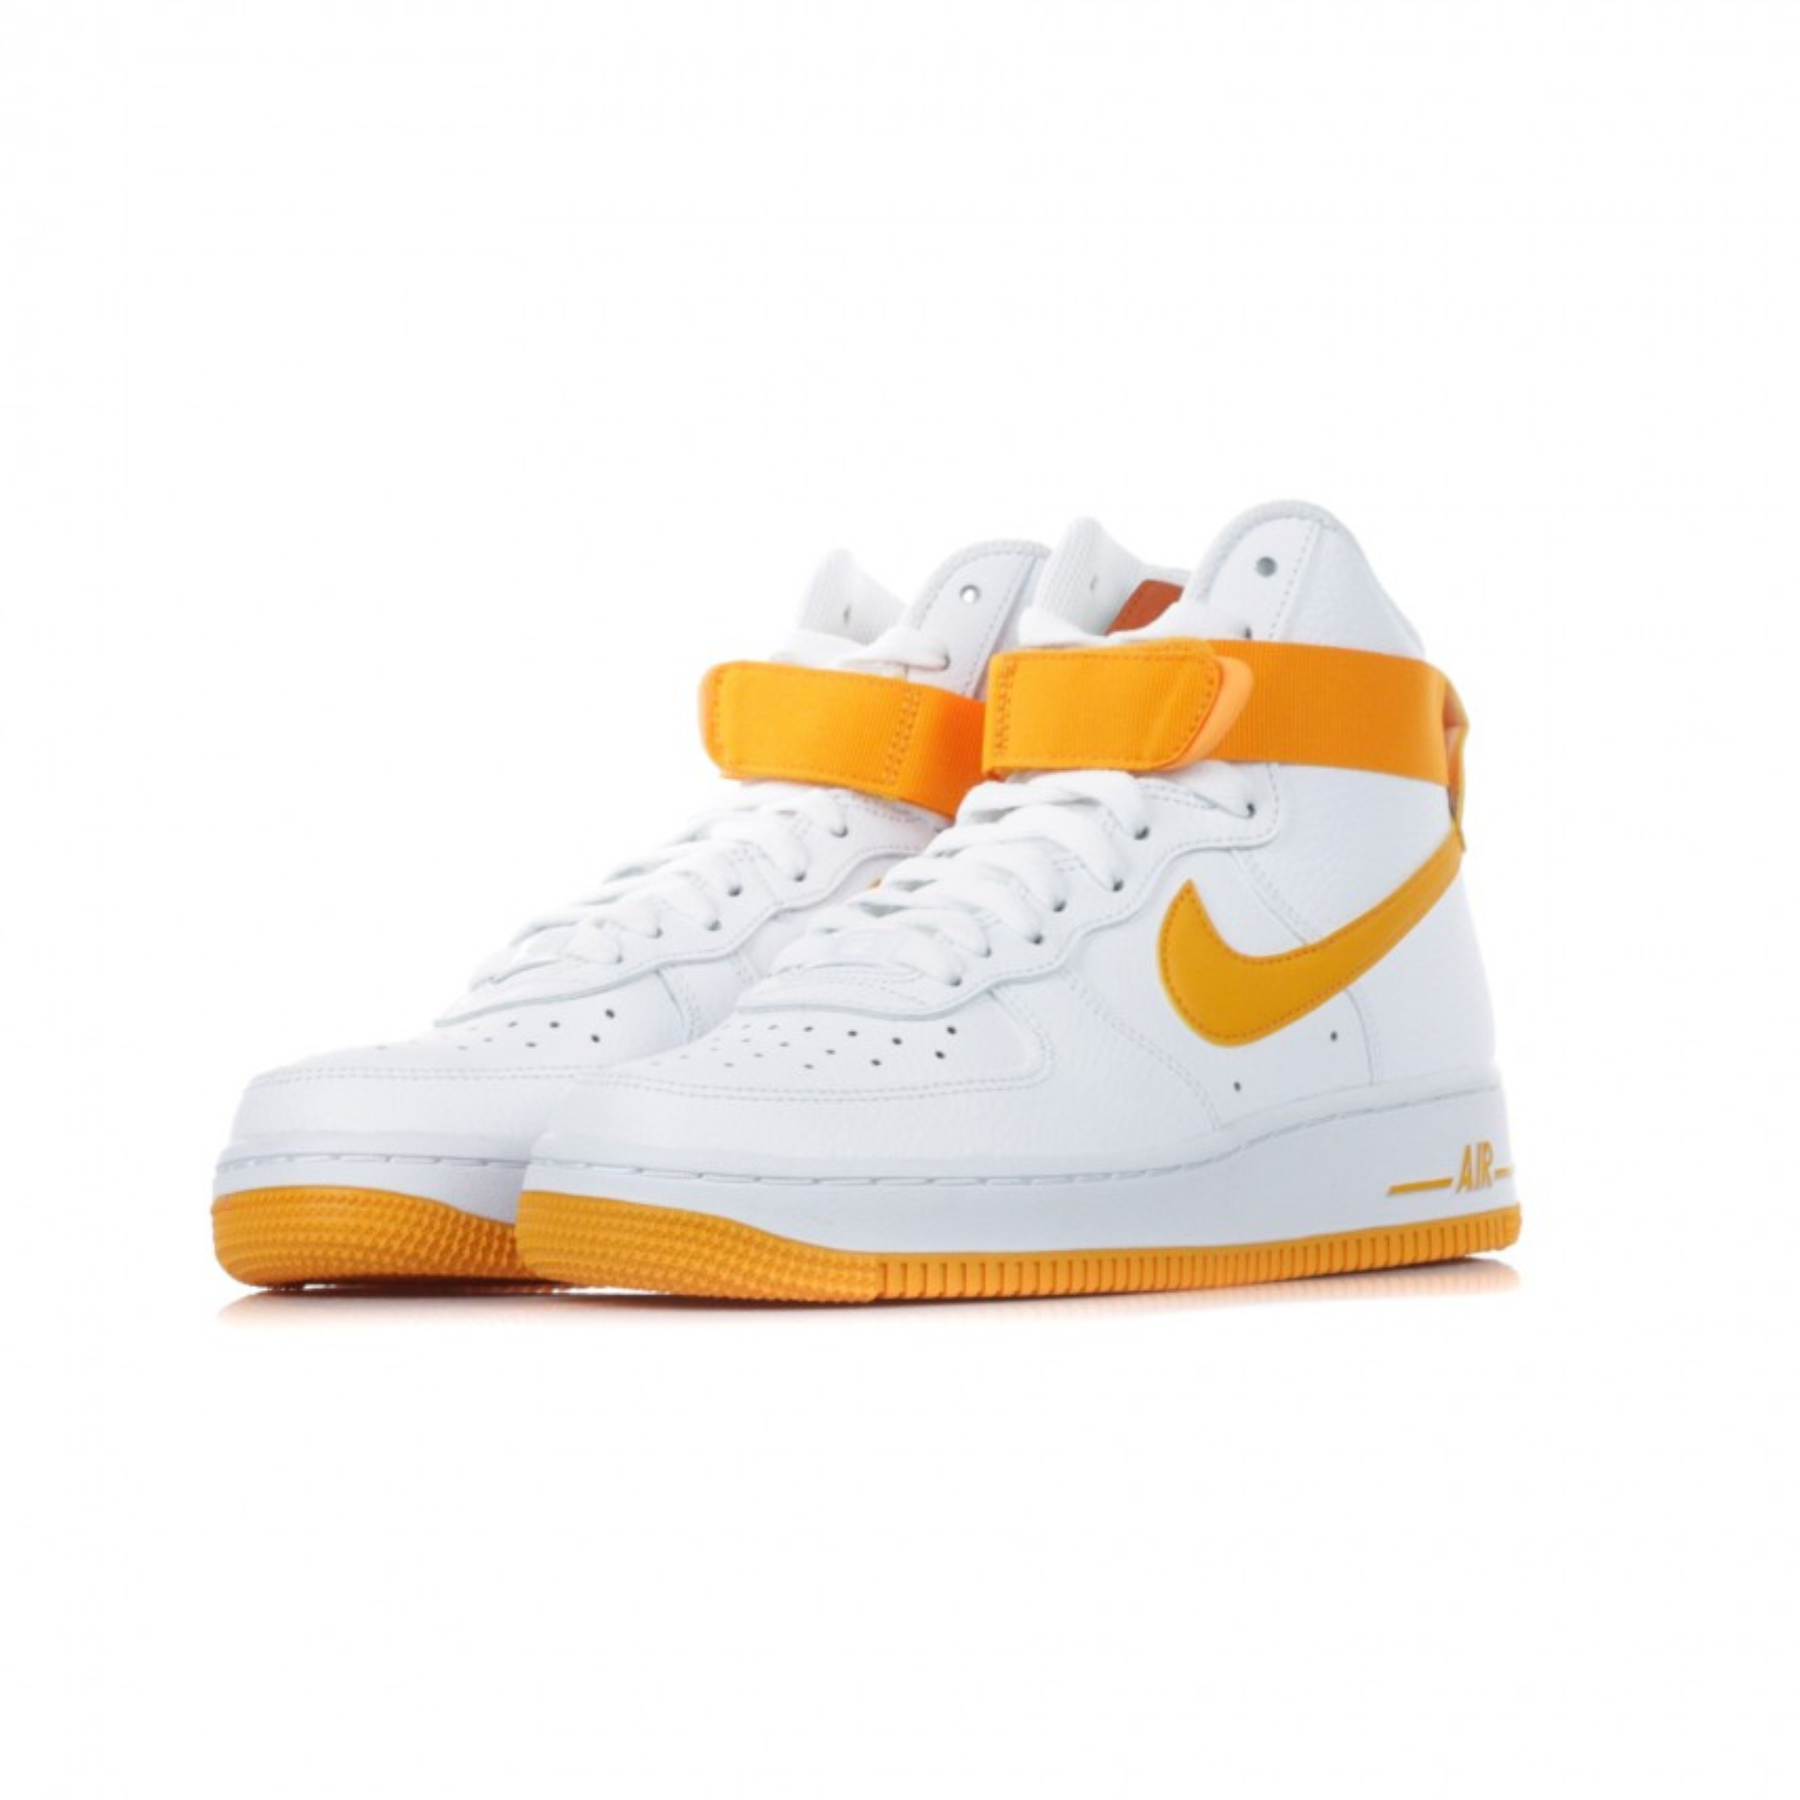 air force 1 con baffo arancione